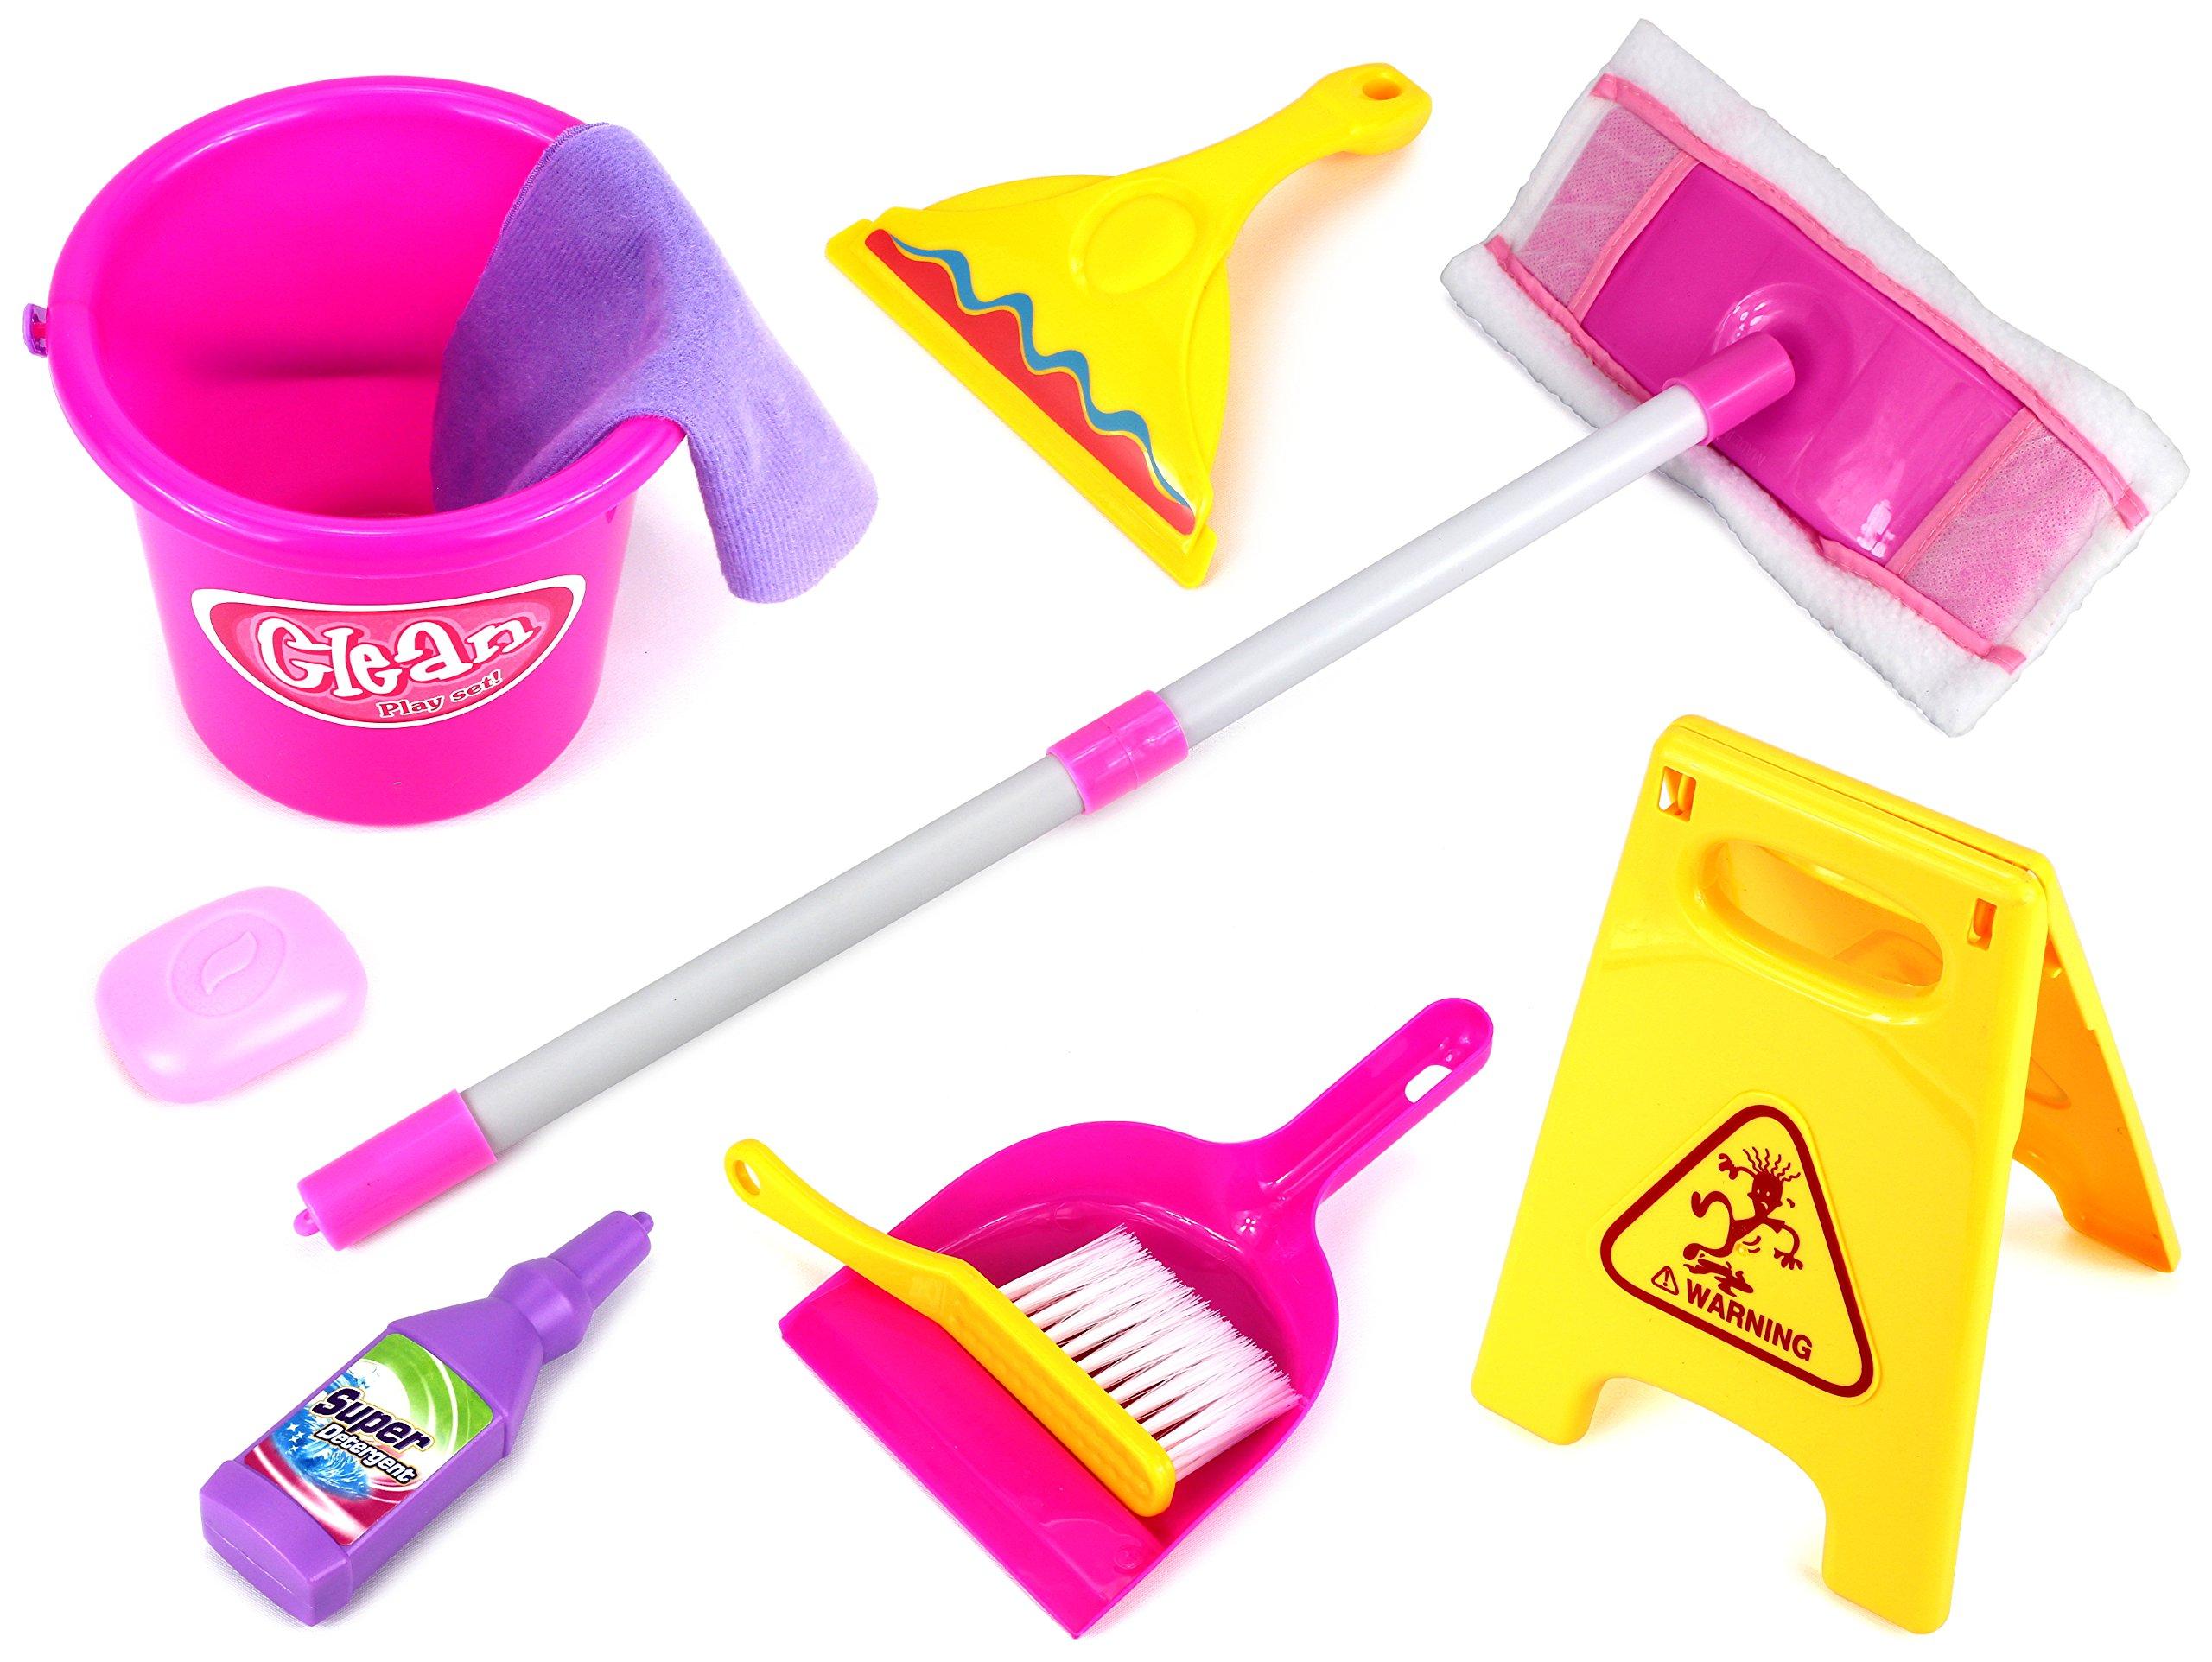 Velocity Toys Little Helper 'F' Deluxe Children's Kid's Pretend Play Toy Cleaning Play Set w/ Floor Dust Mop, Bucket, Dust Pan, Brush, Squeegee, Cleaning Rag, Wet Floor Sign, Mock Soap Bottle & Bar